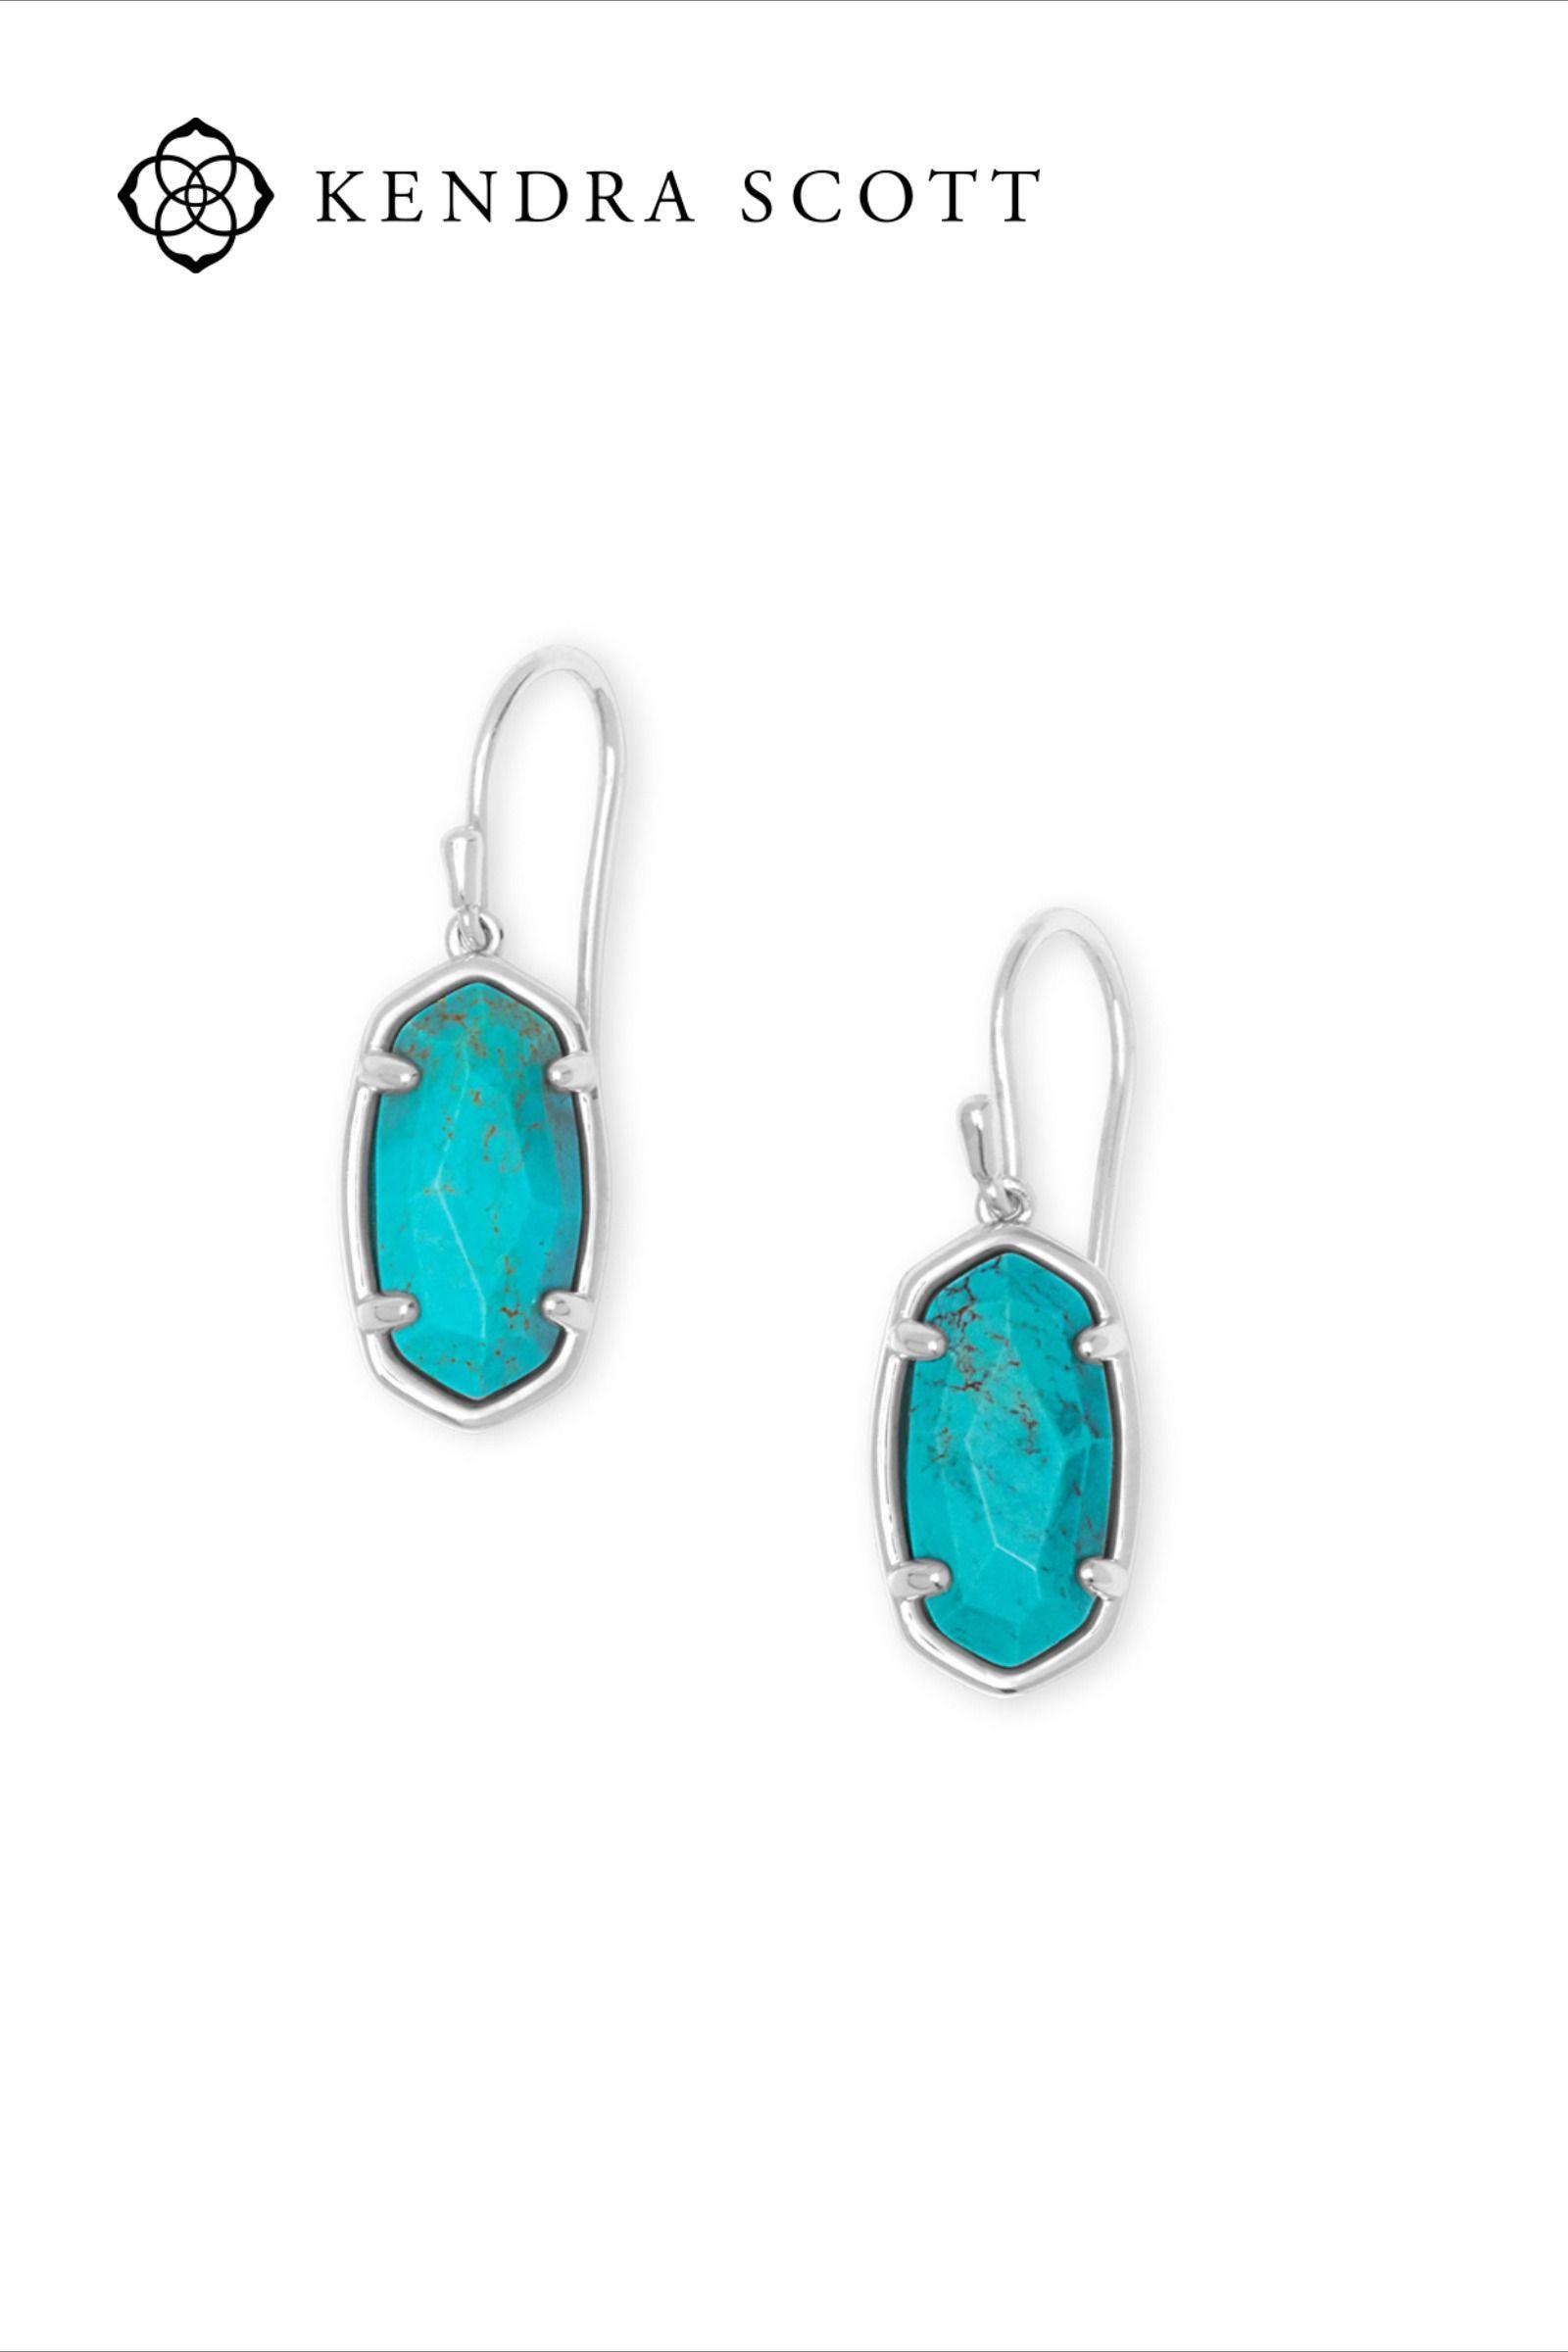 Turquoise Earrings Lee Sterling Silver Jewelry Drop Earrings In Genuine Turquoise In 2020 Sterling Silver Drop Earrings Silver Drop Earrings Jewelry